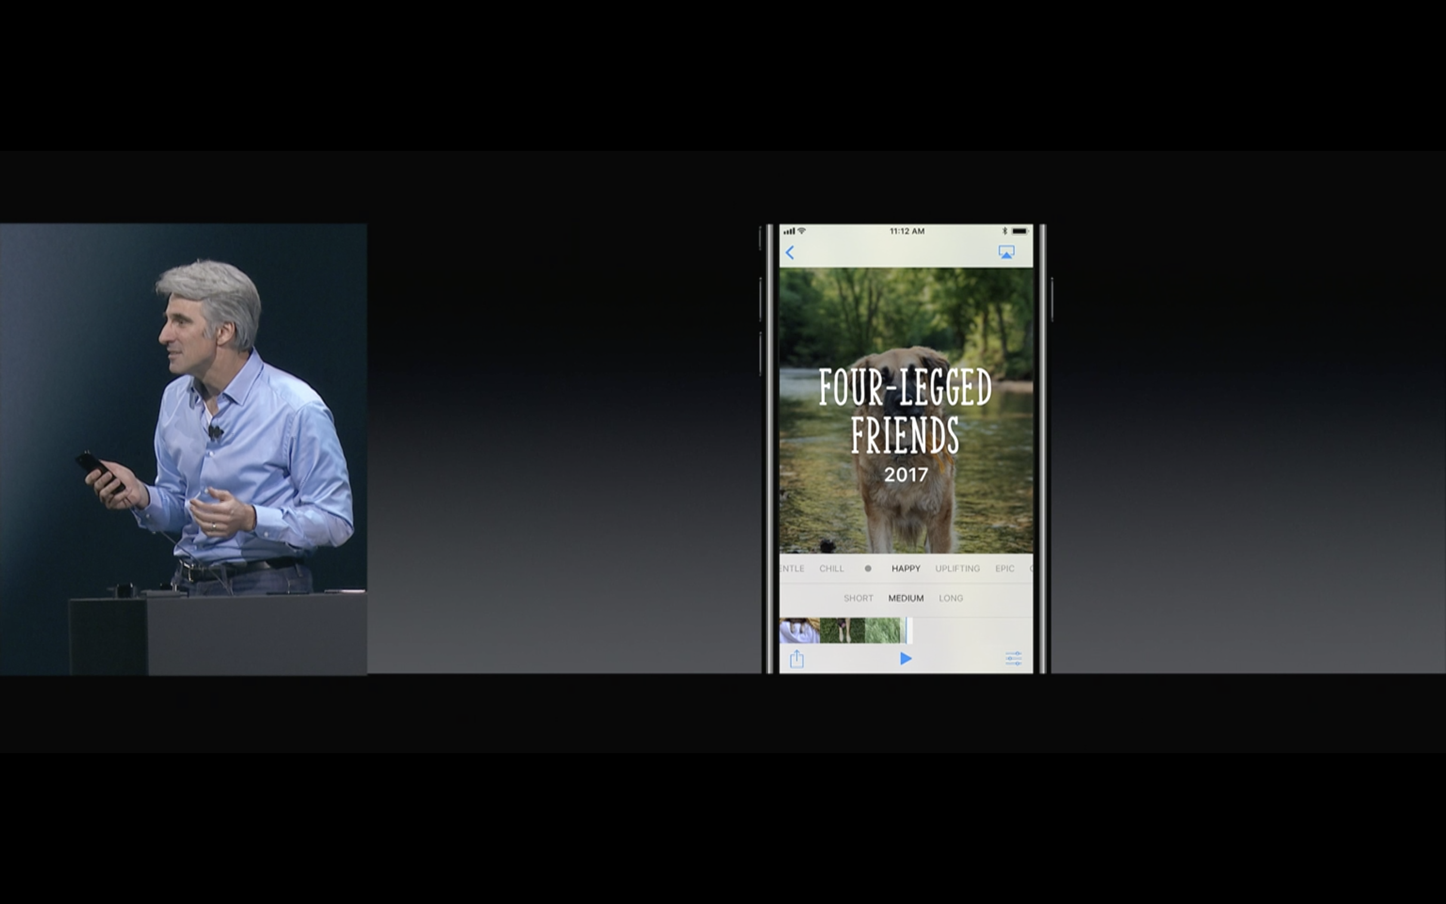 iOS11-2017-WWDC17-44.png